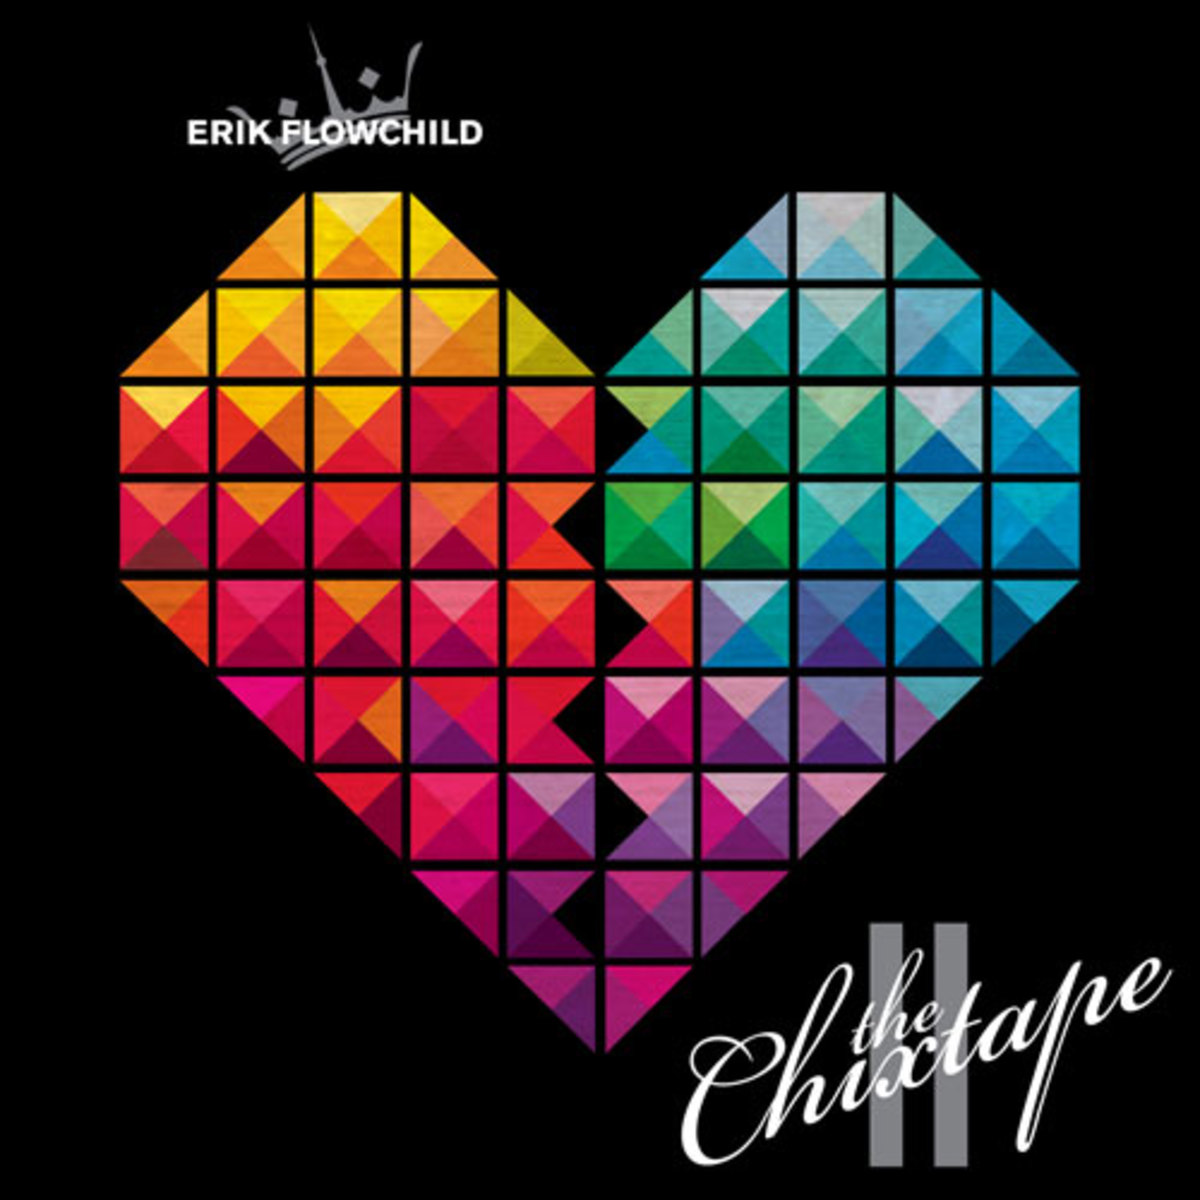 erikflowchild-chixtape2.jpg